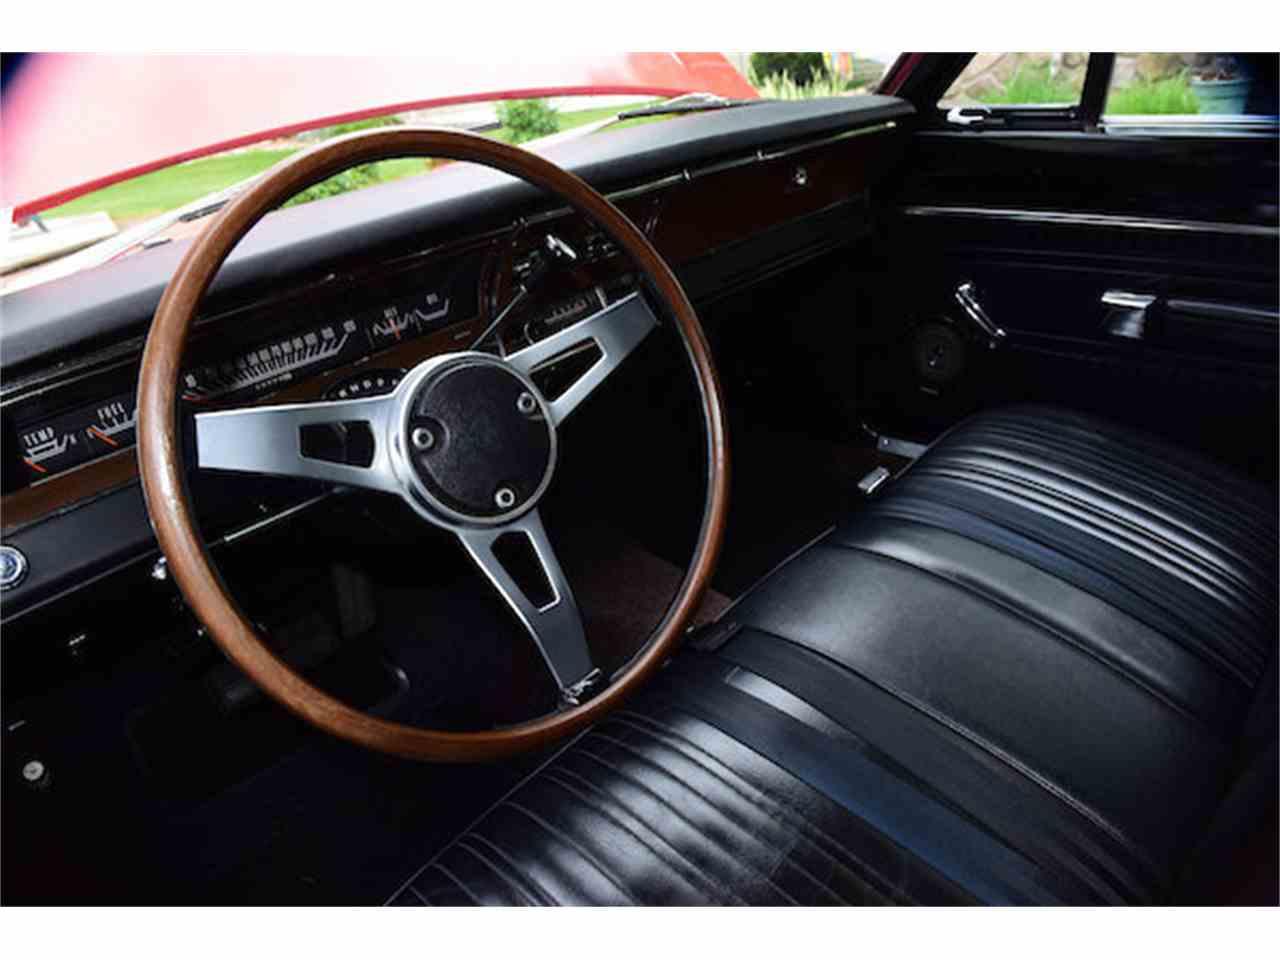 1971 Dodge Dart Swinger For Sale Classiccars Com Cc 998026